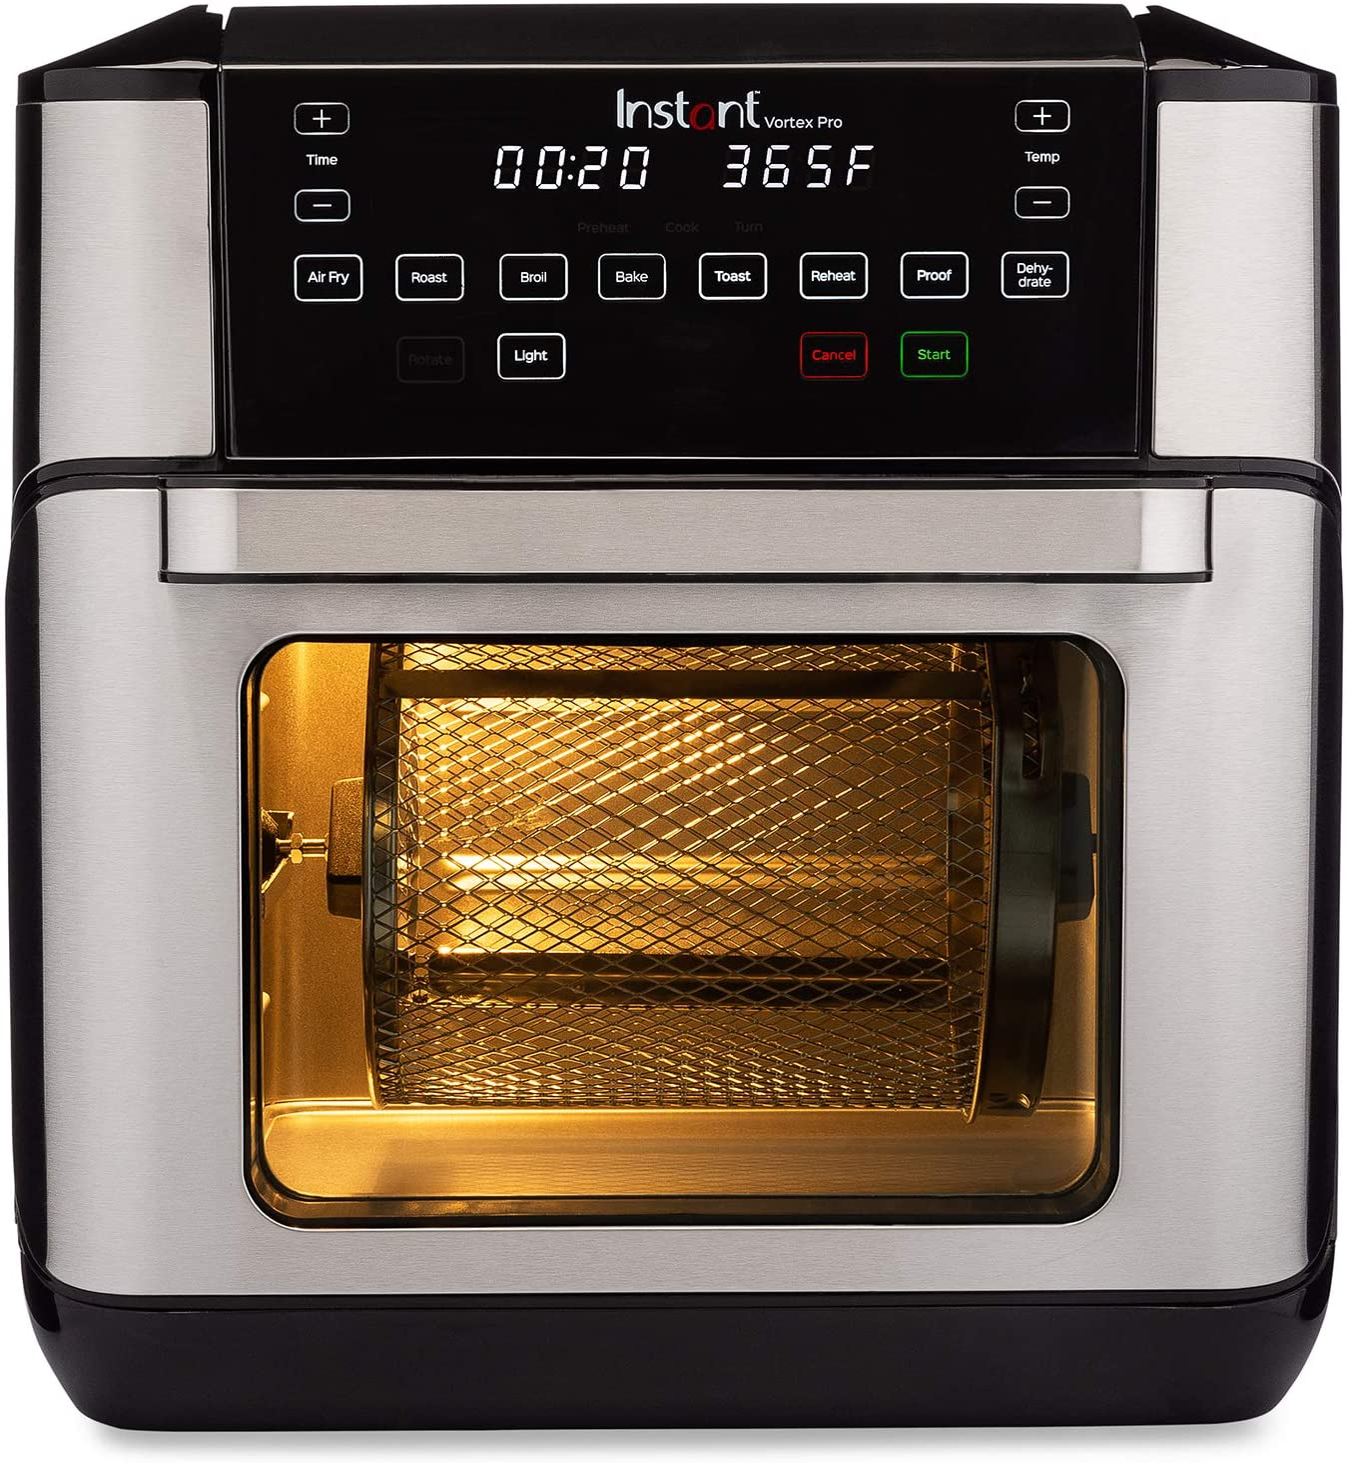 Best compact- Instant Vortex Pro Air Fryer